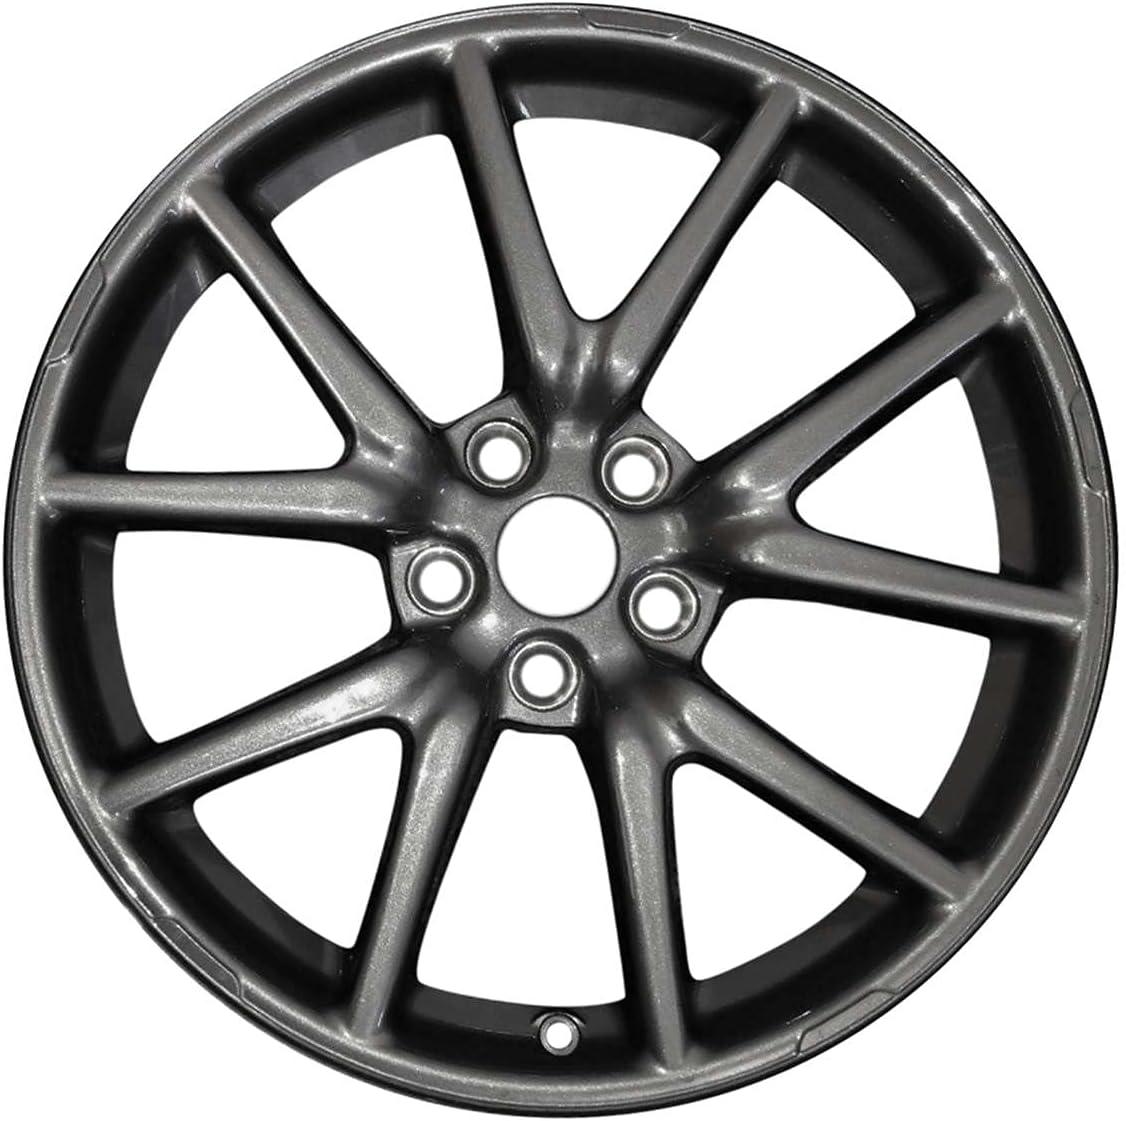 Auto Rim Shop - New Cheap Reconditioned for Mo 18